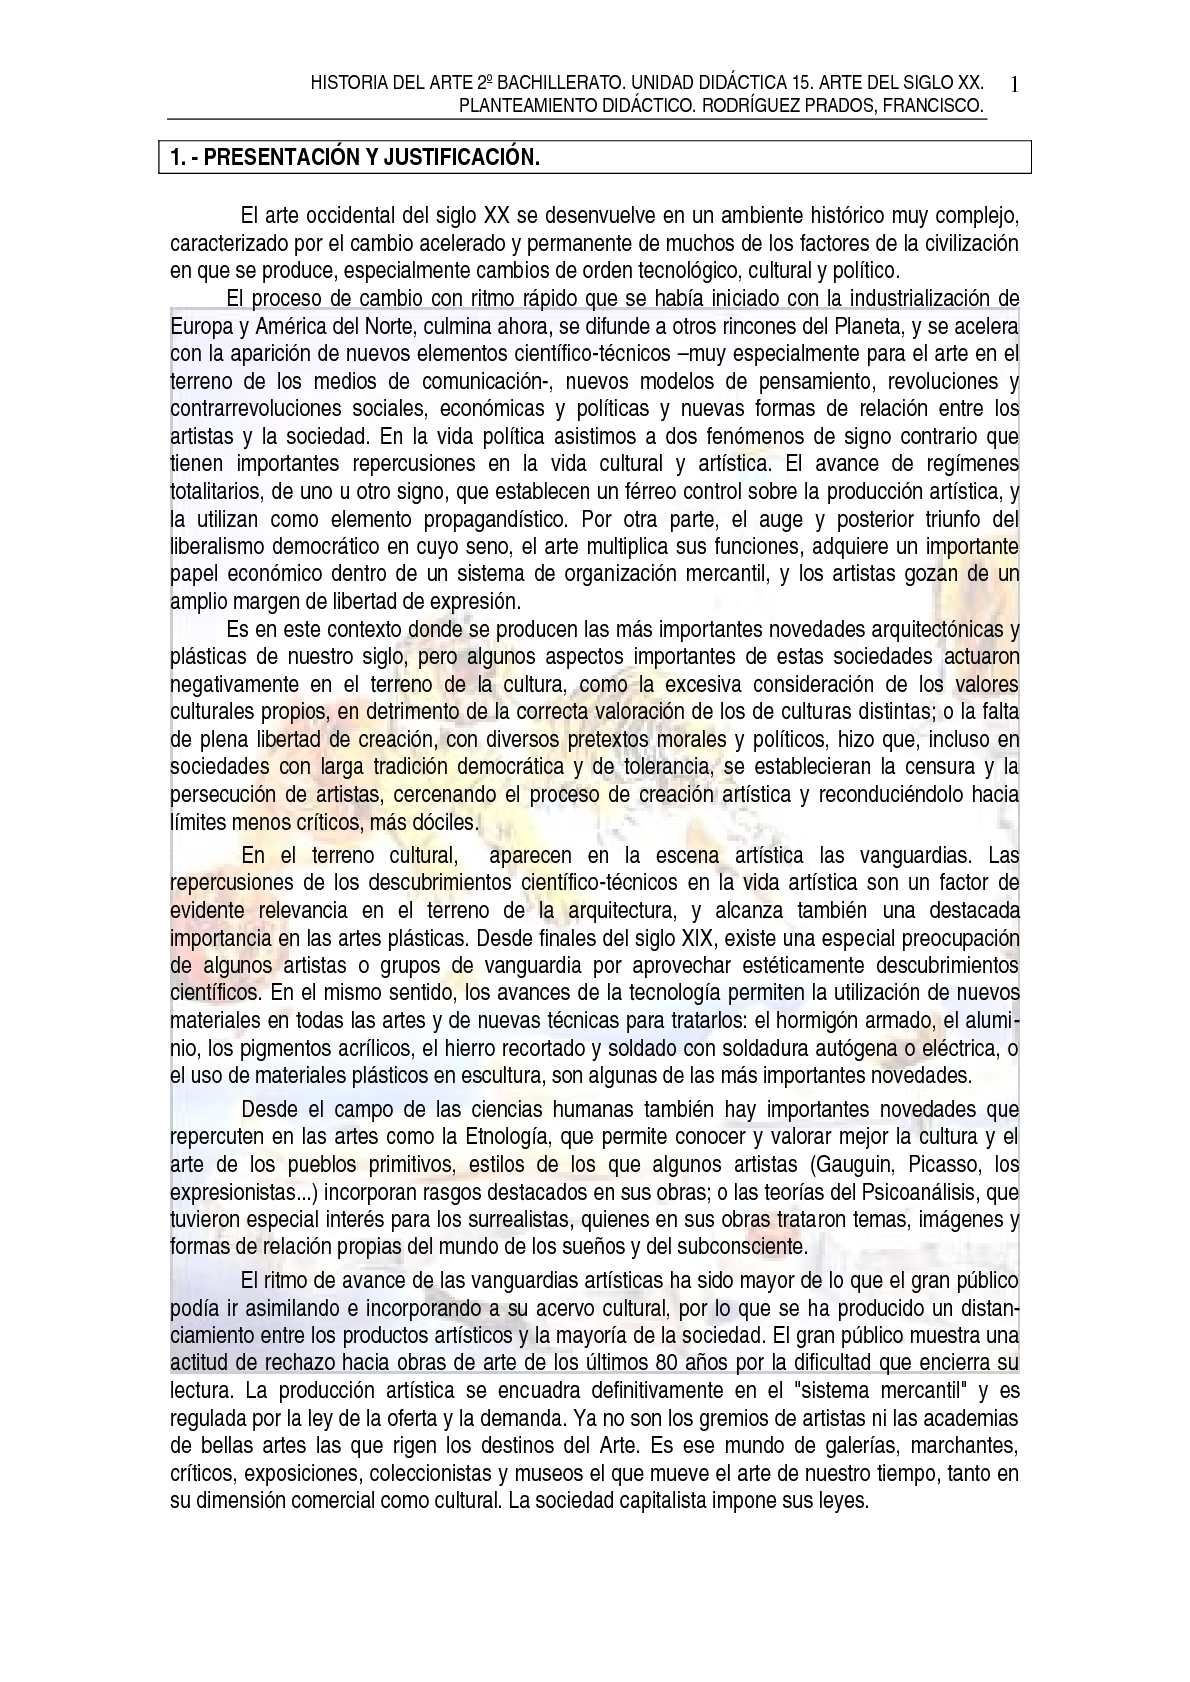 TEMA 15. ARTE SIGLO XX. COMPLETO